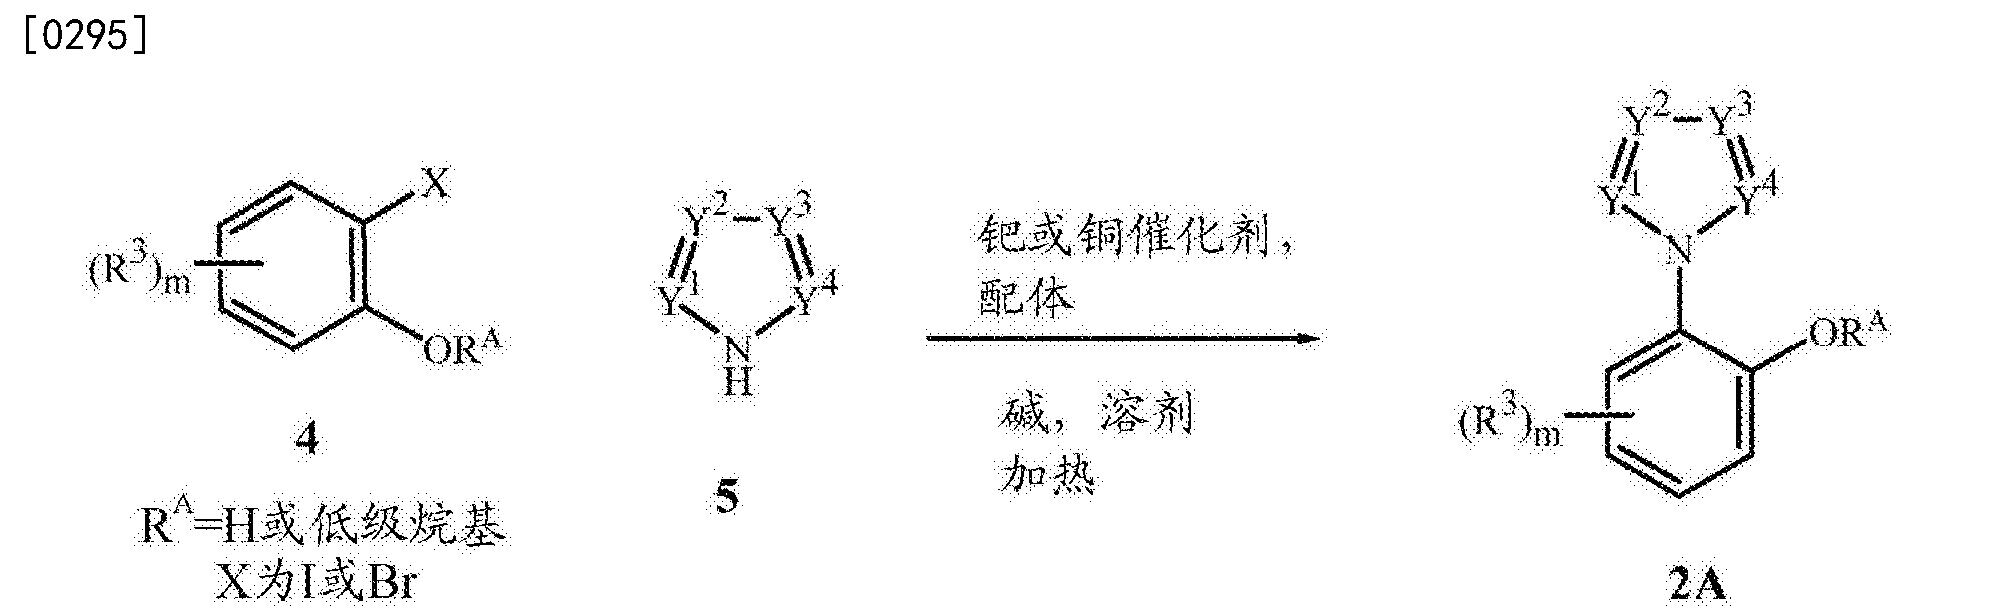 CN106232594A - Herbicidal substituted pyrimidinyloxy benzene ... 053b56ac5c7e